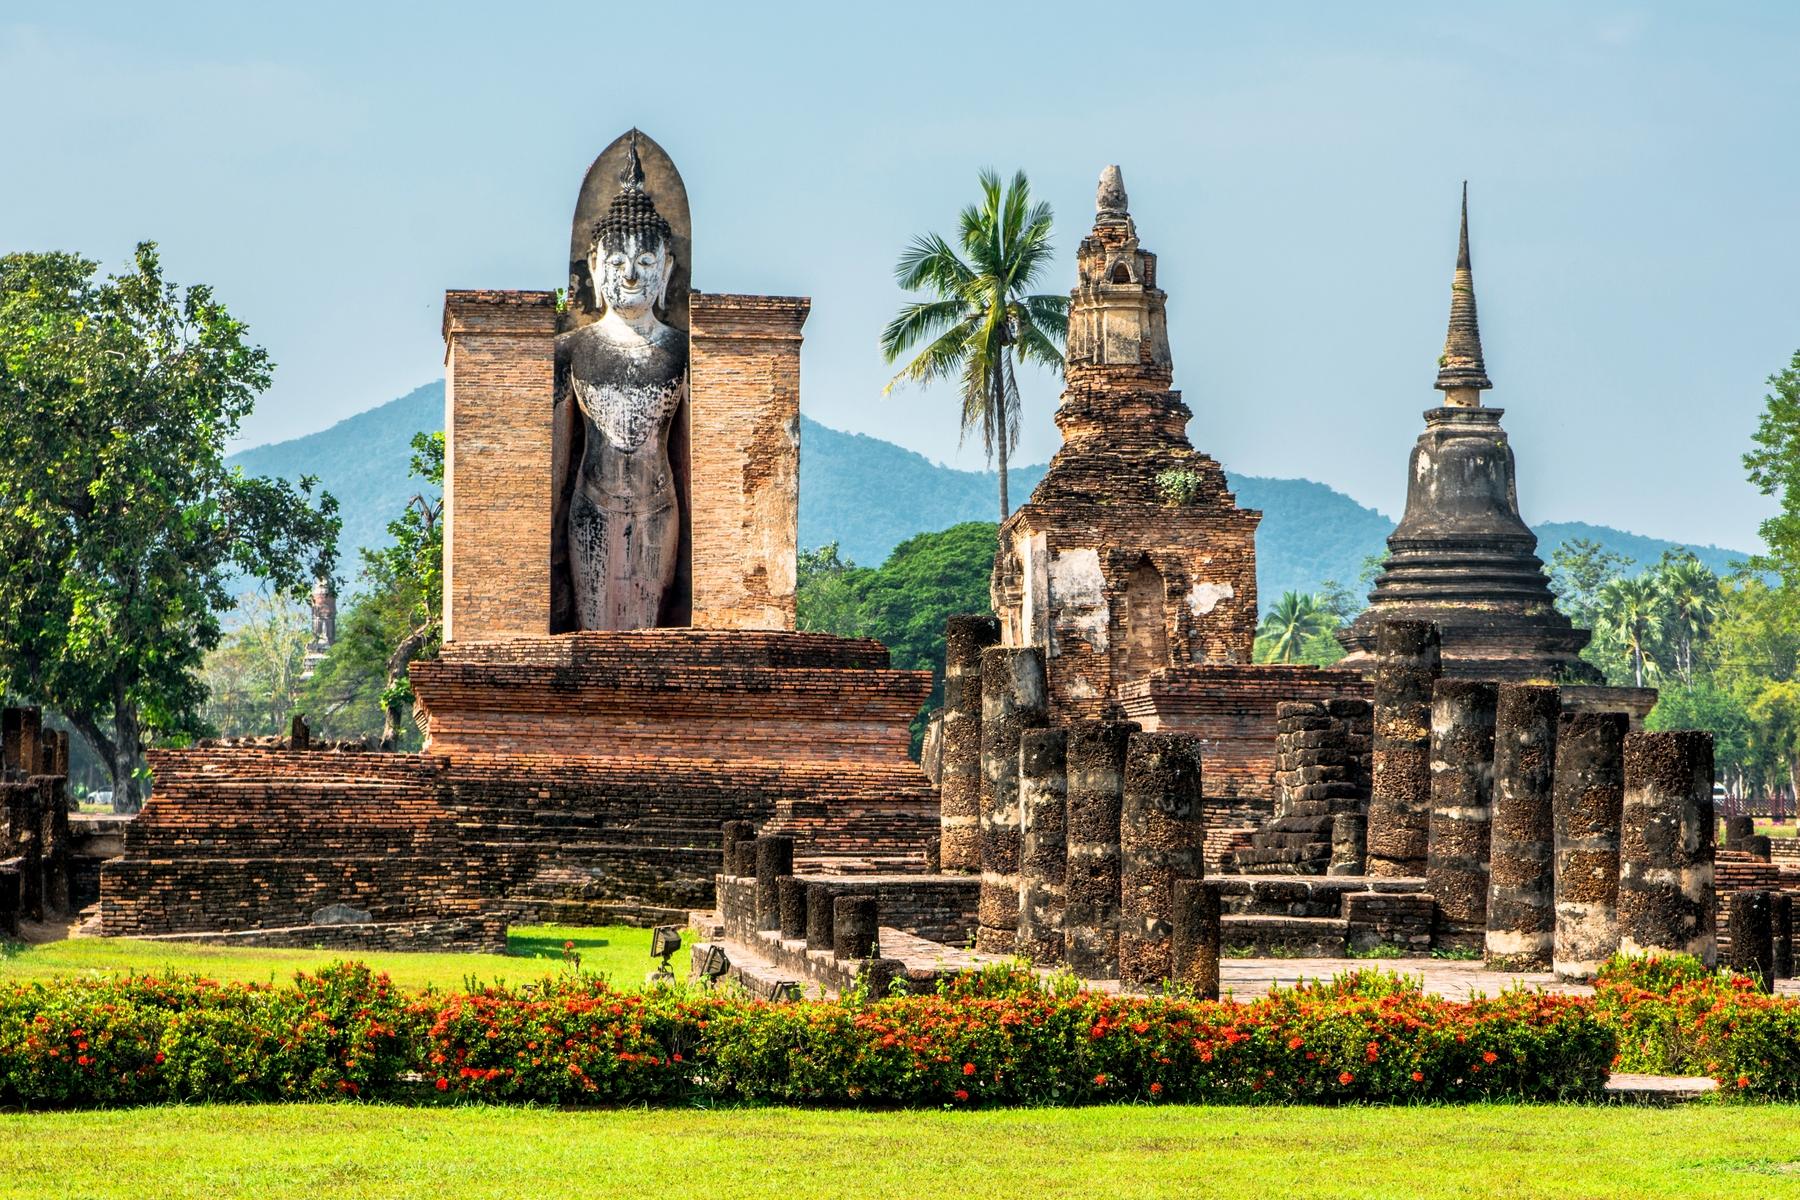 Статуя стоячего Будды на территории вата Махатхат в Таиланде